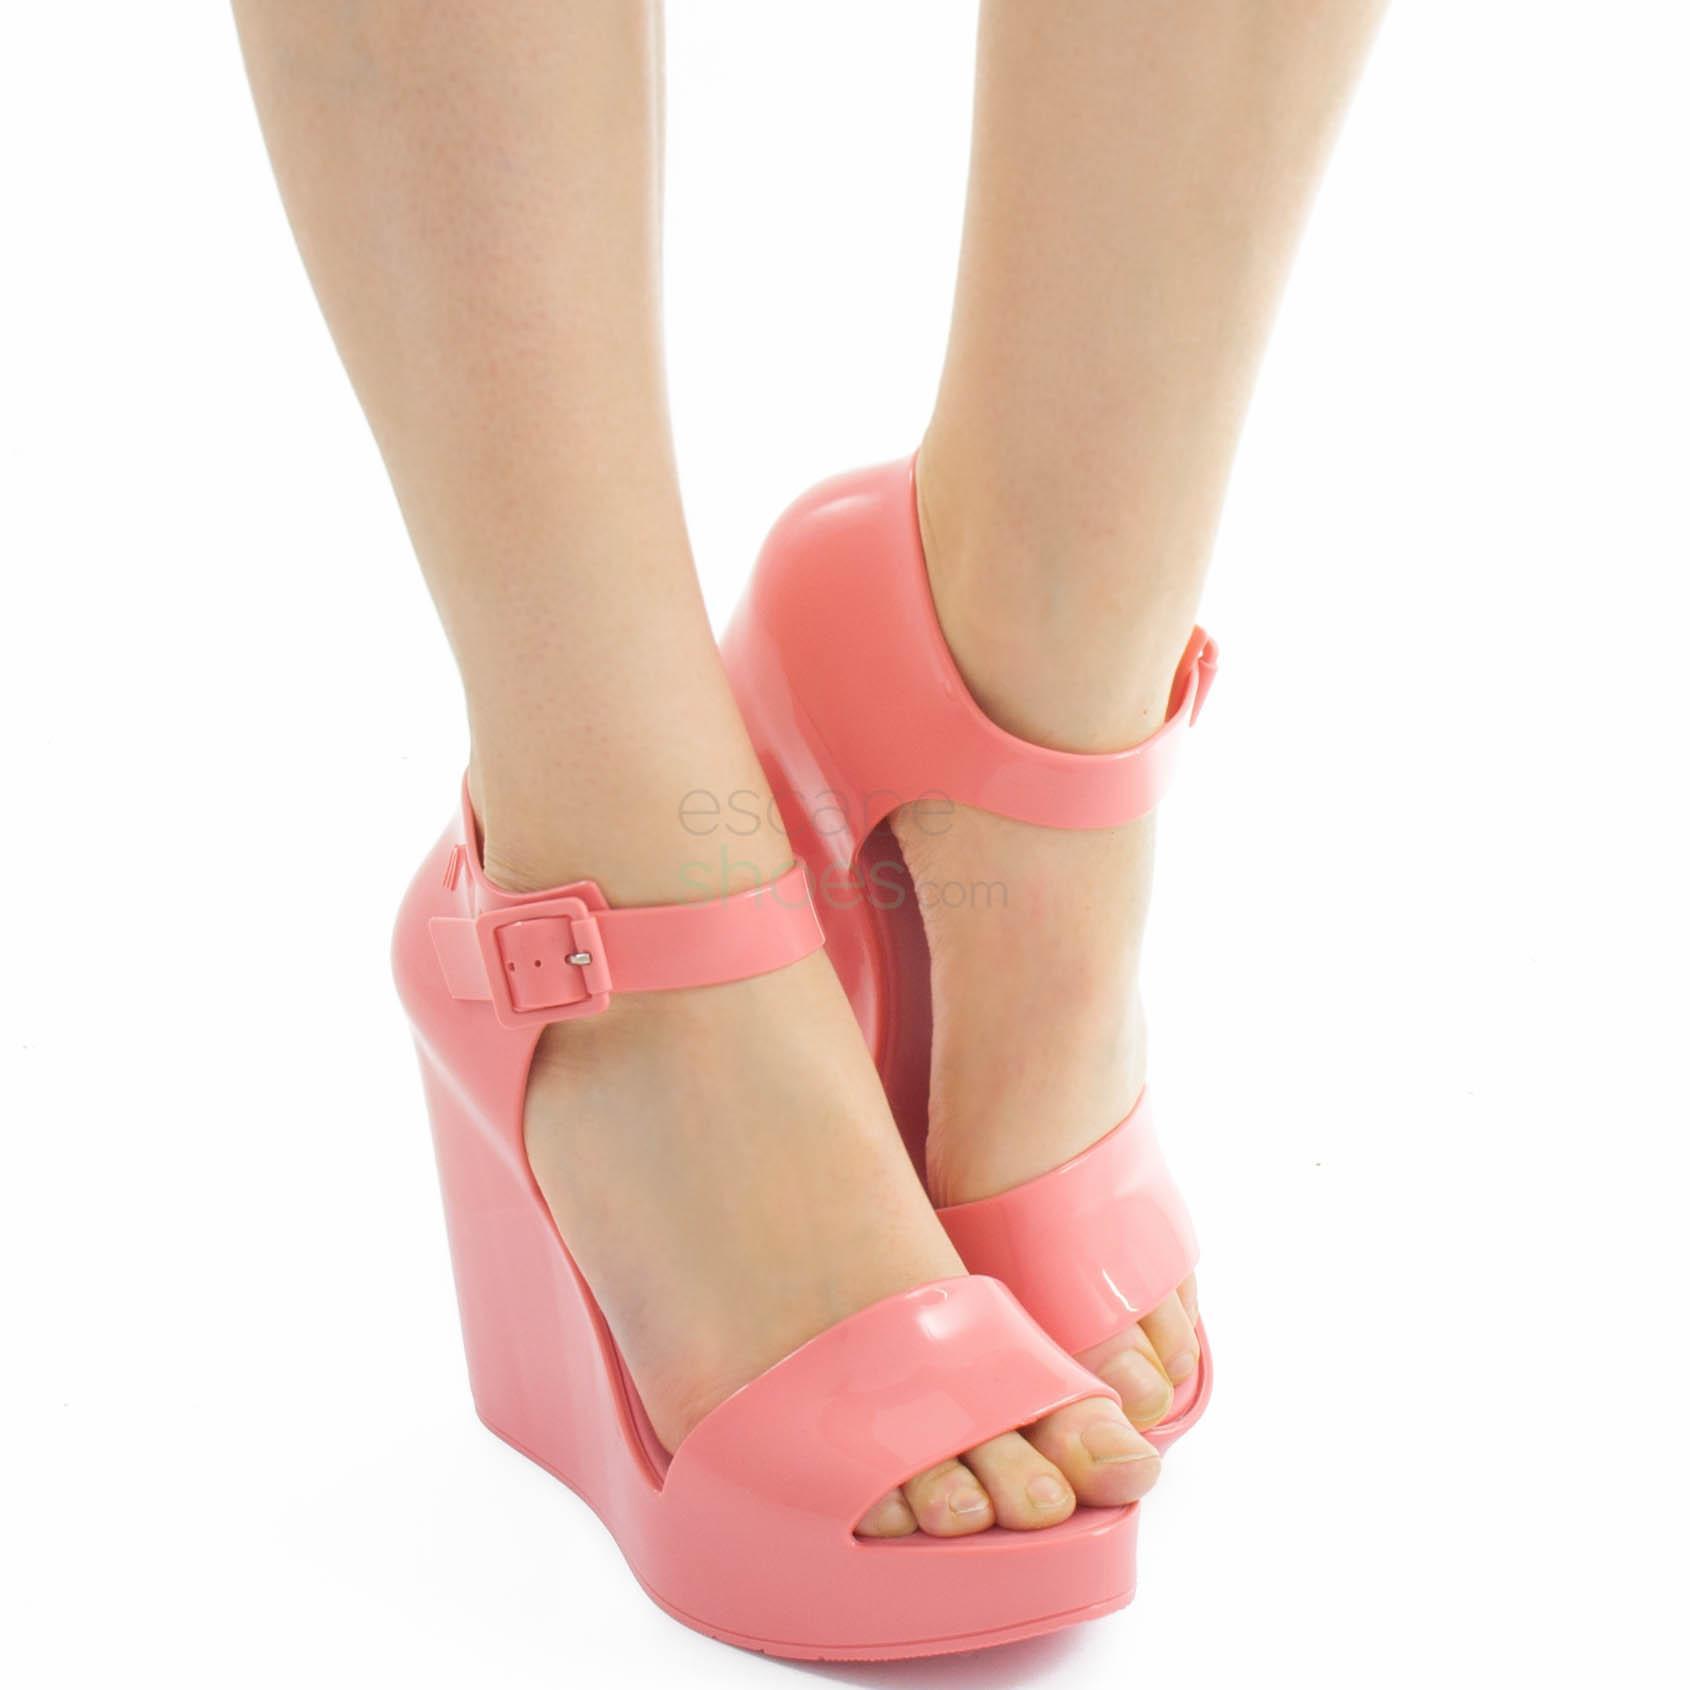 Sandals MELISSA Mar Wedge Pink MW.18.042B